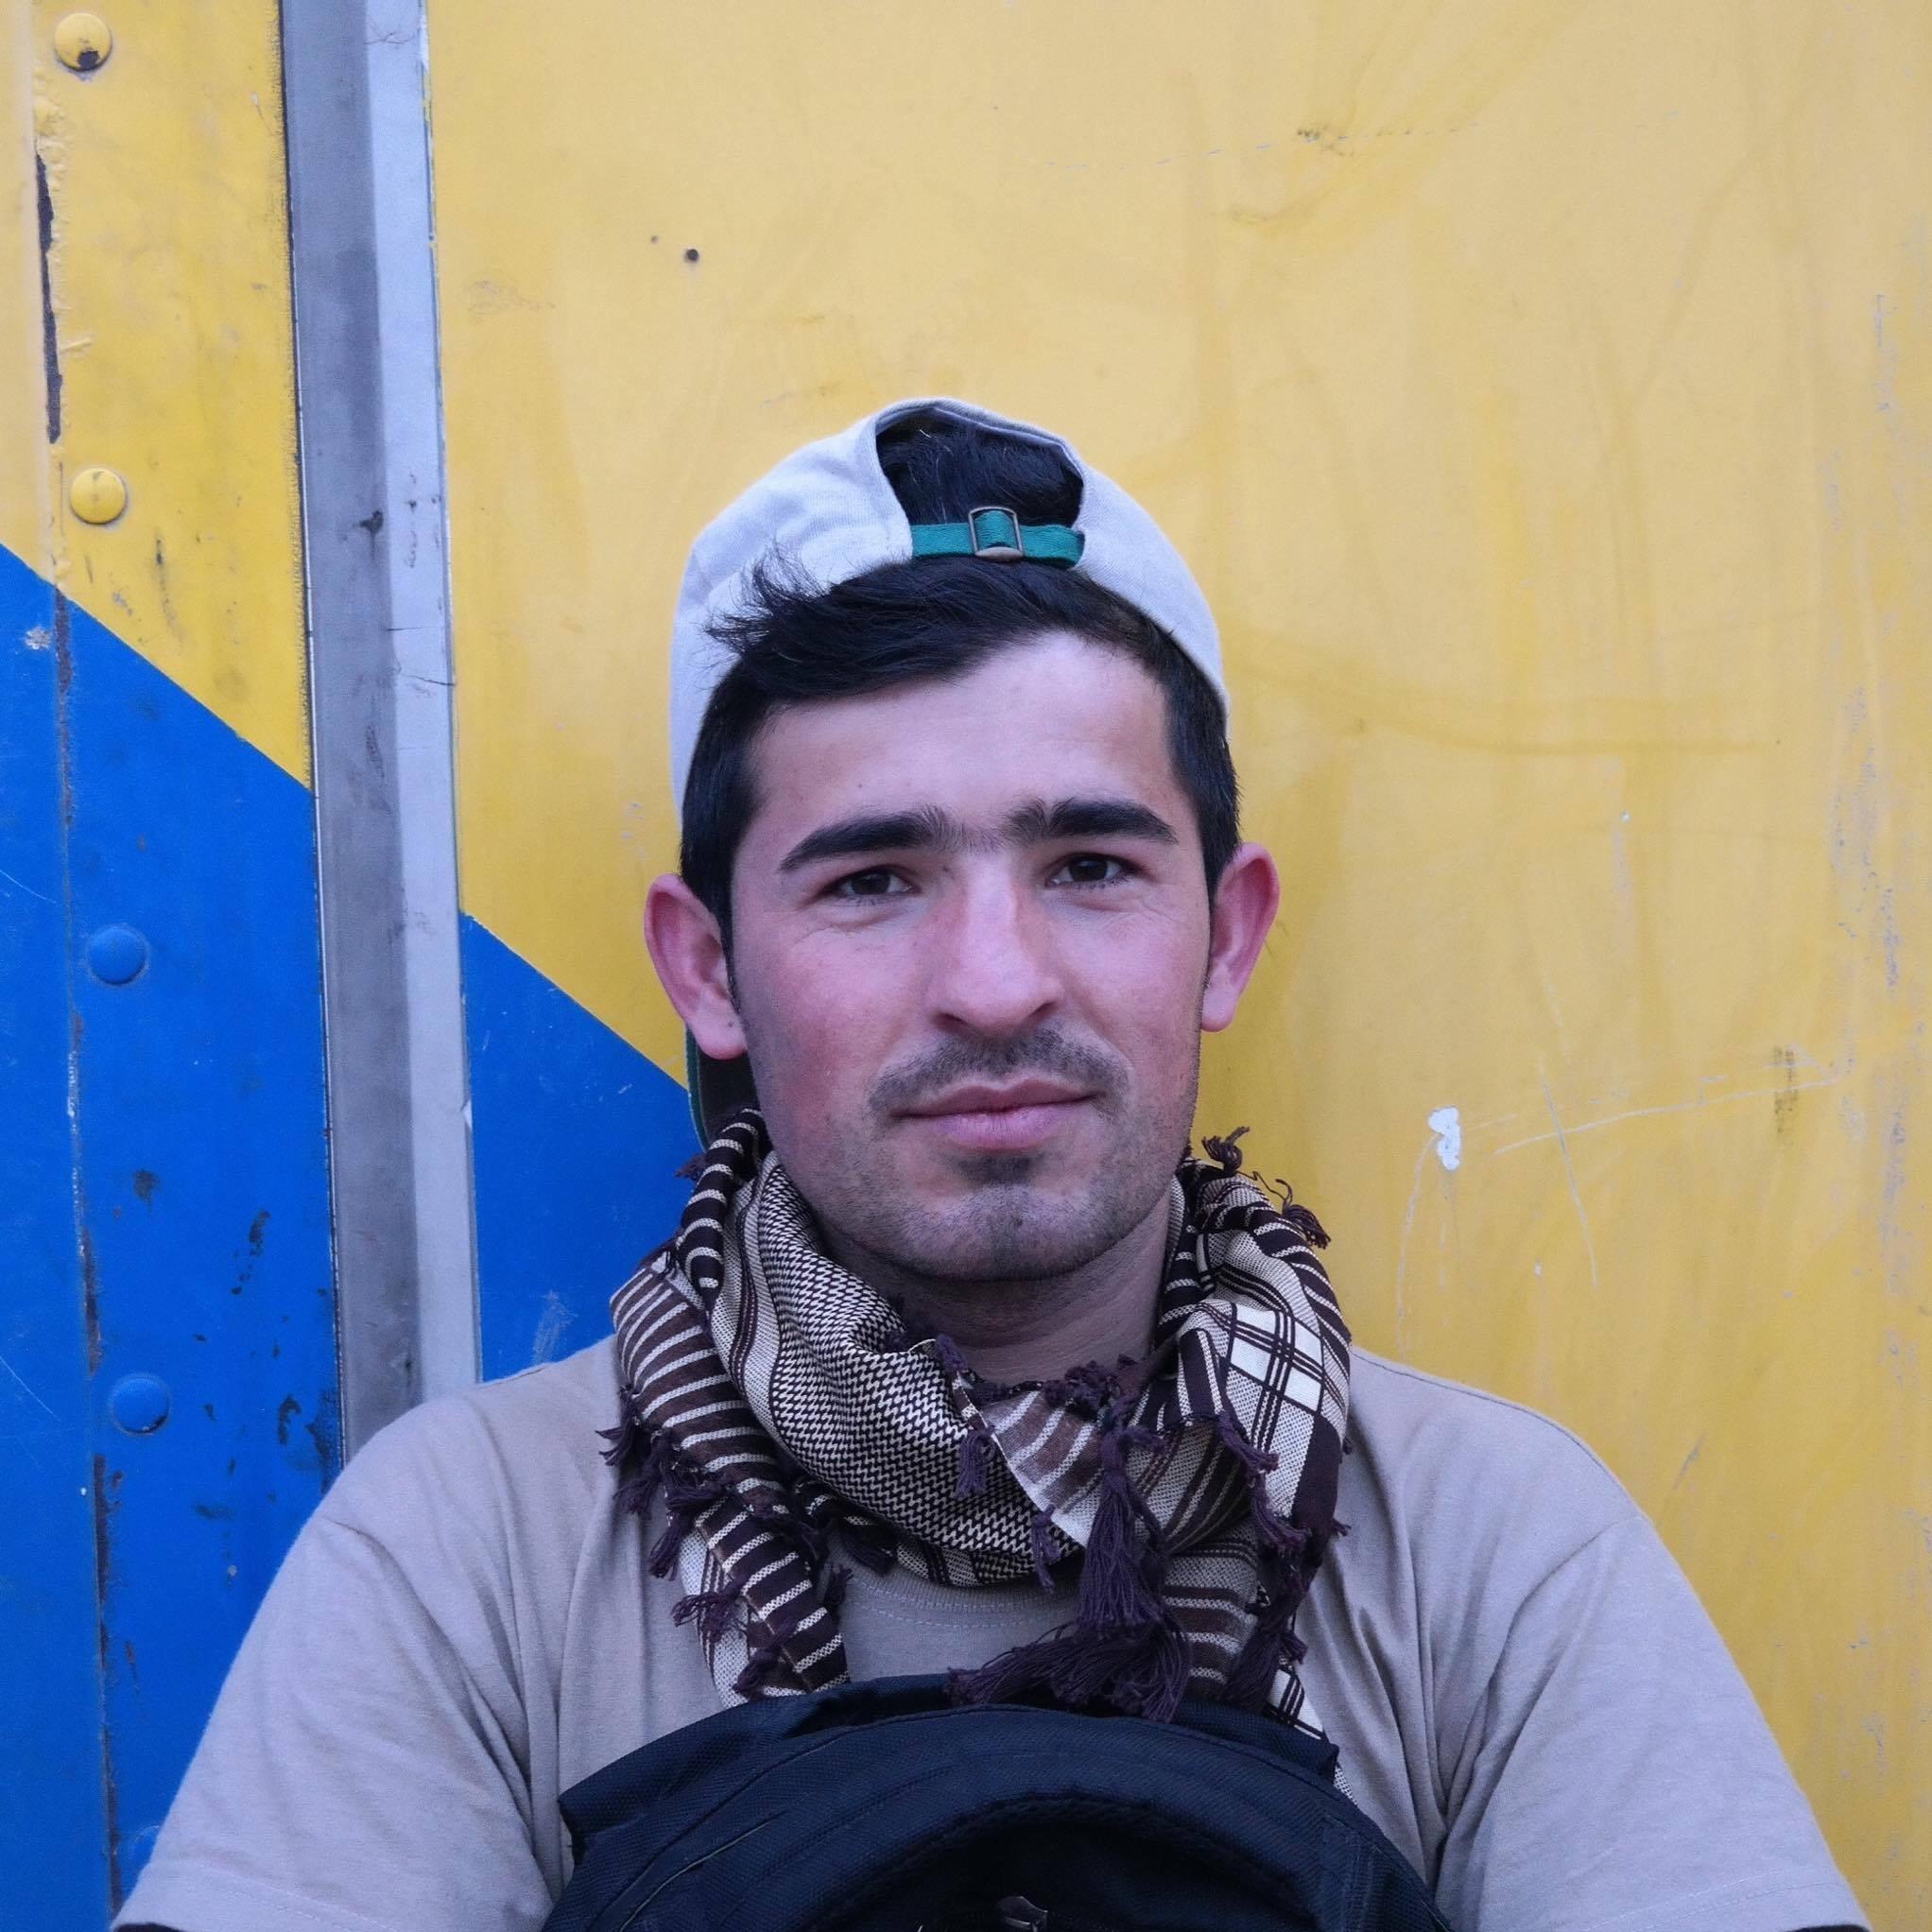 SHAYAN HAKIMZADA Kabul, Afghanistan  @EverydayAfg  @shayanhakimzada